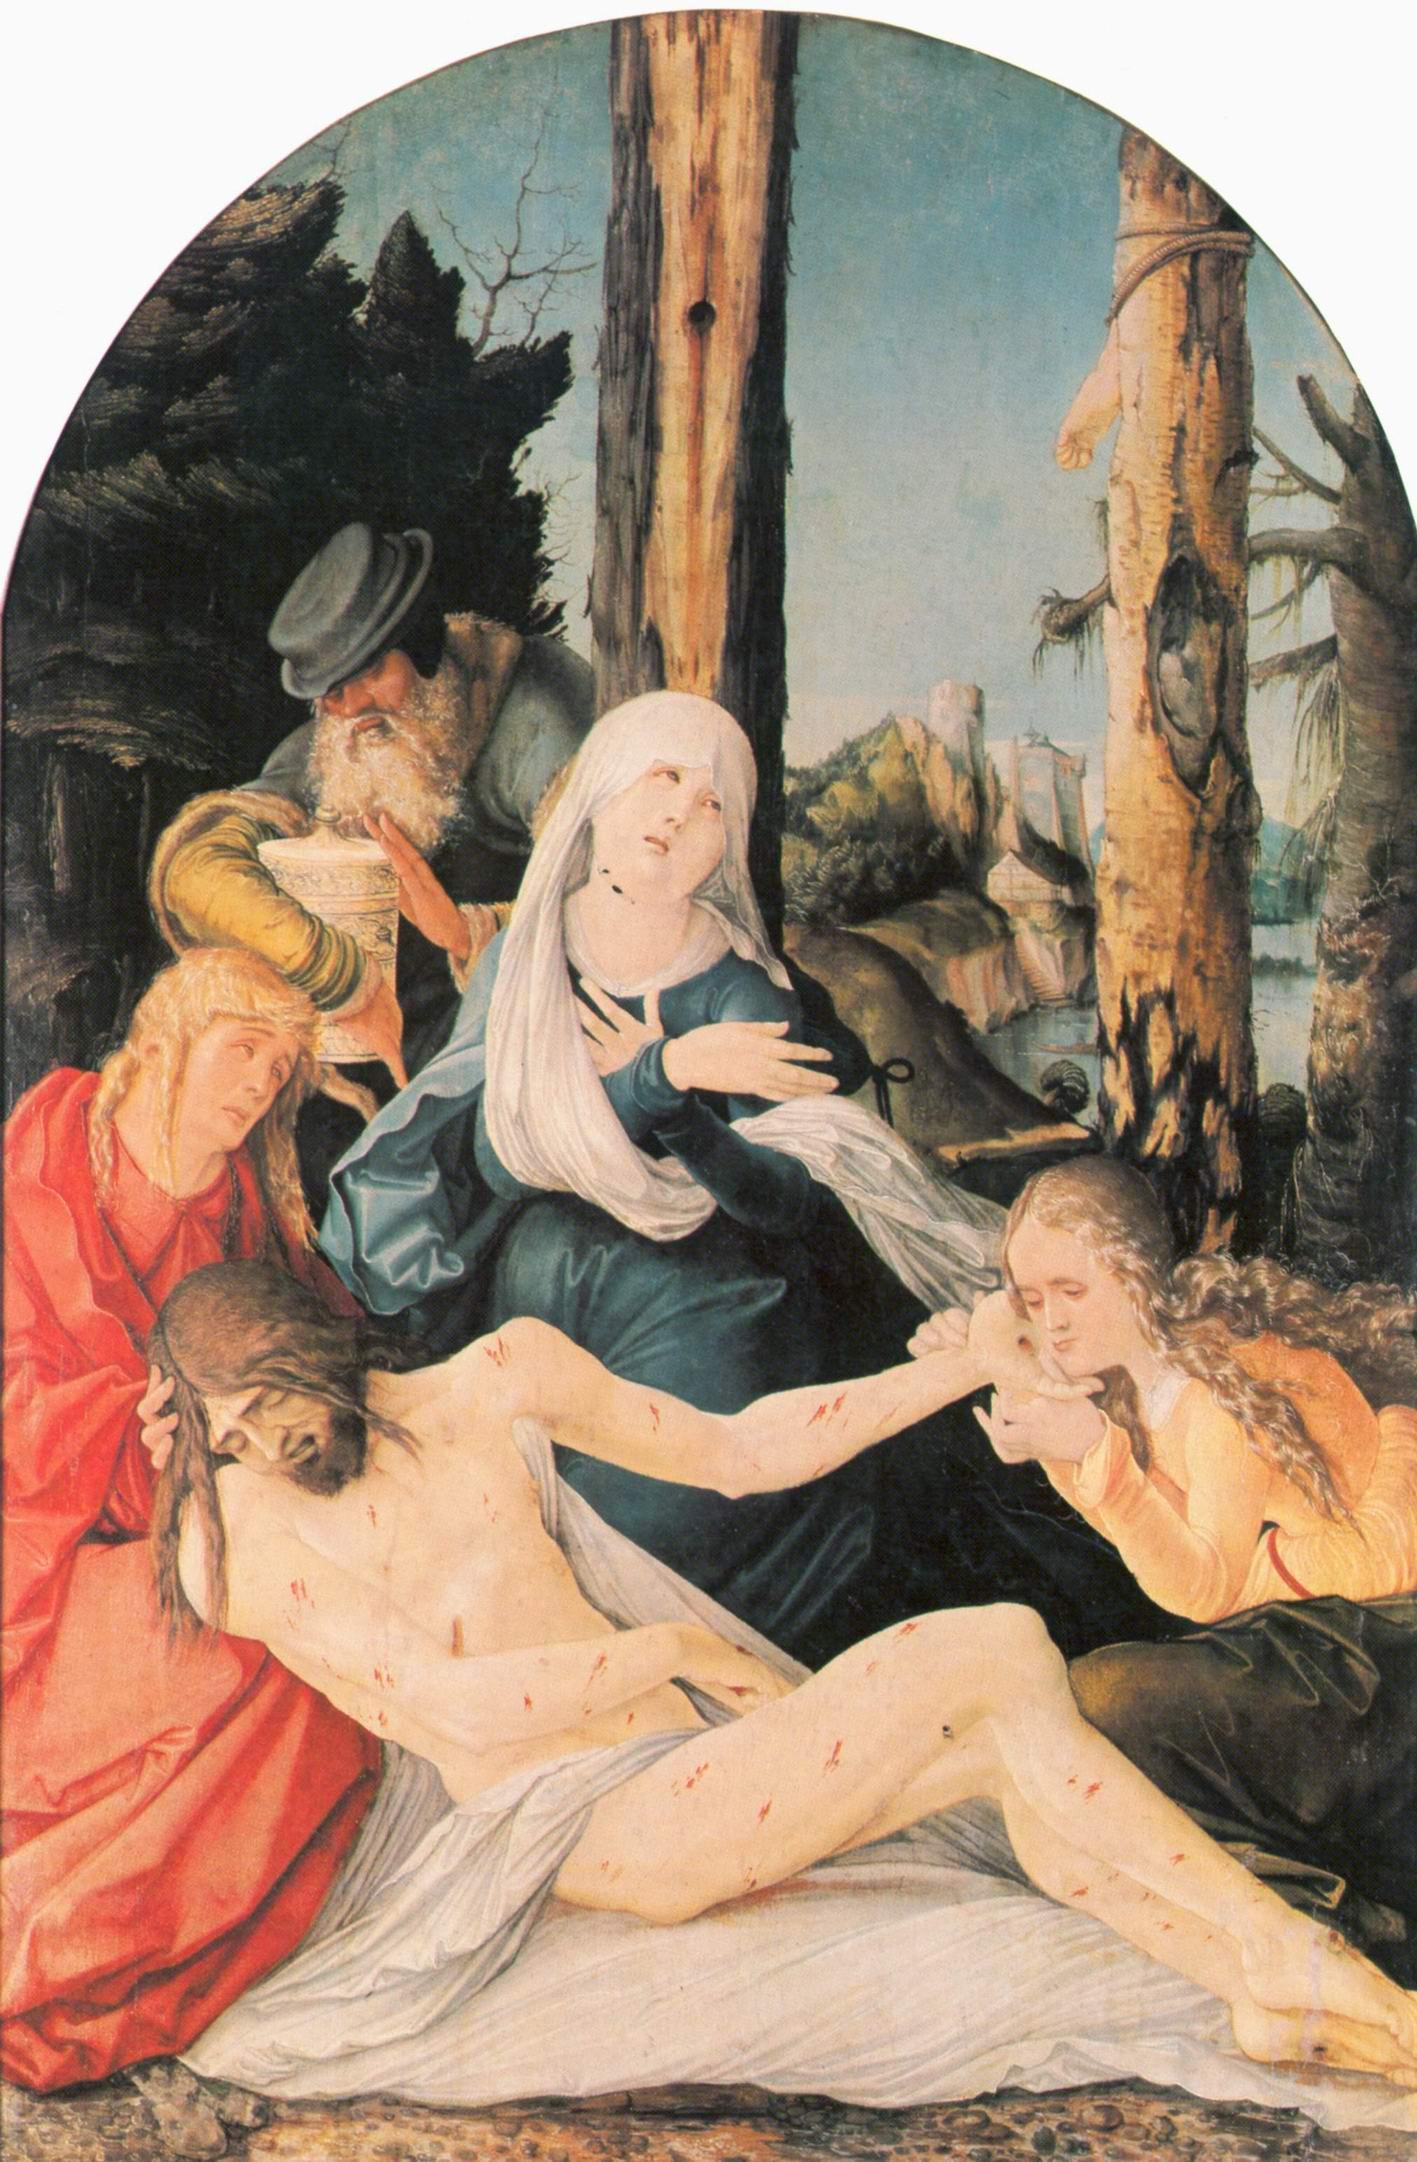 Бальдунг Ханс-Оплакивание Христа, Бальдунг Ханс